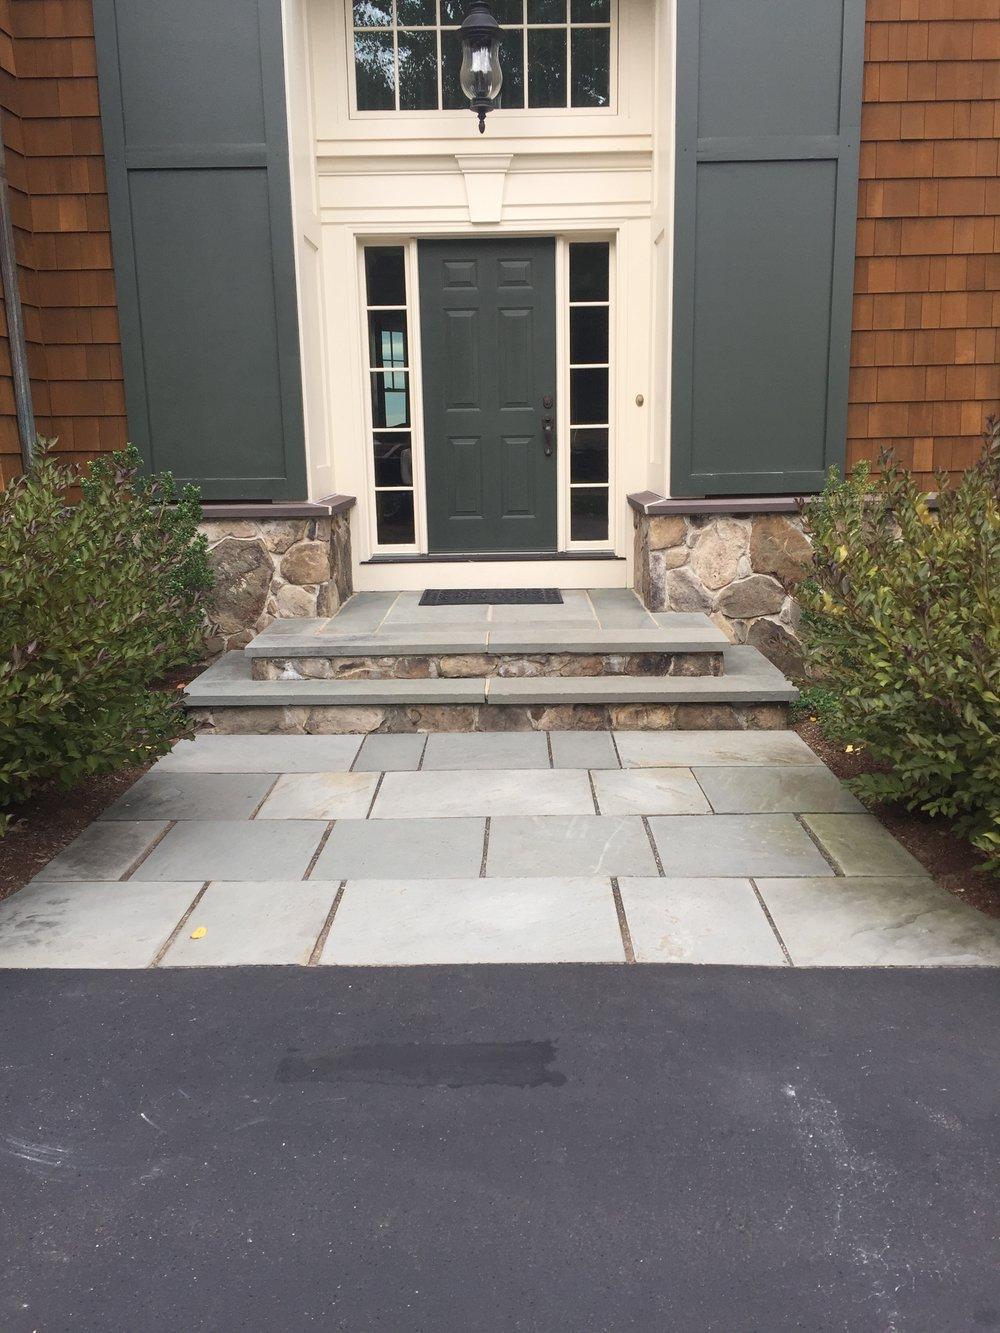 Professional front entrance paver walkways inLexington, MA